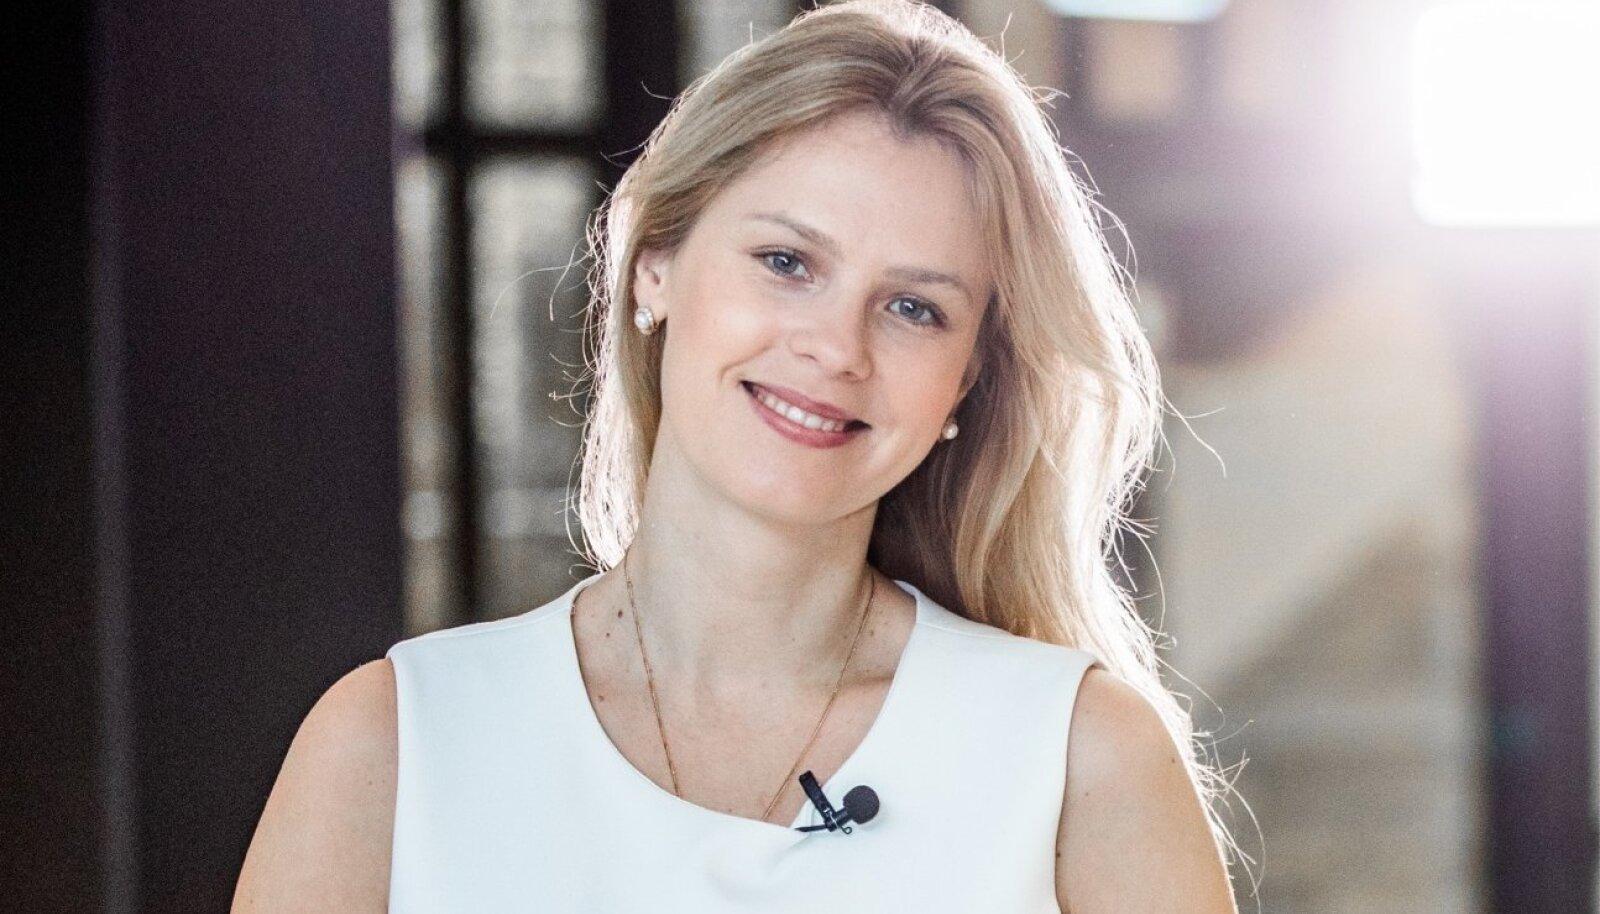 Katrin Lust